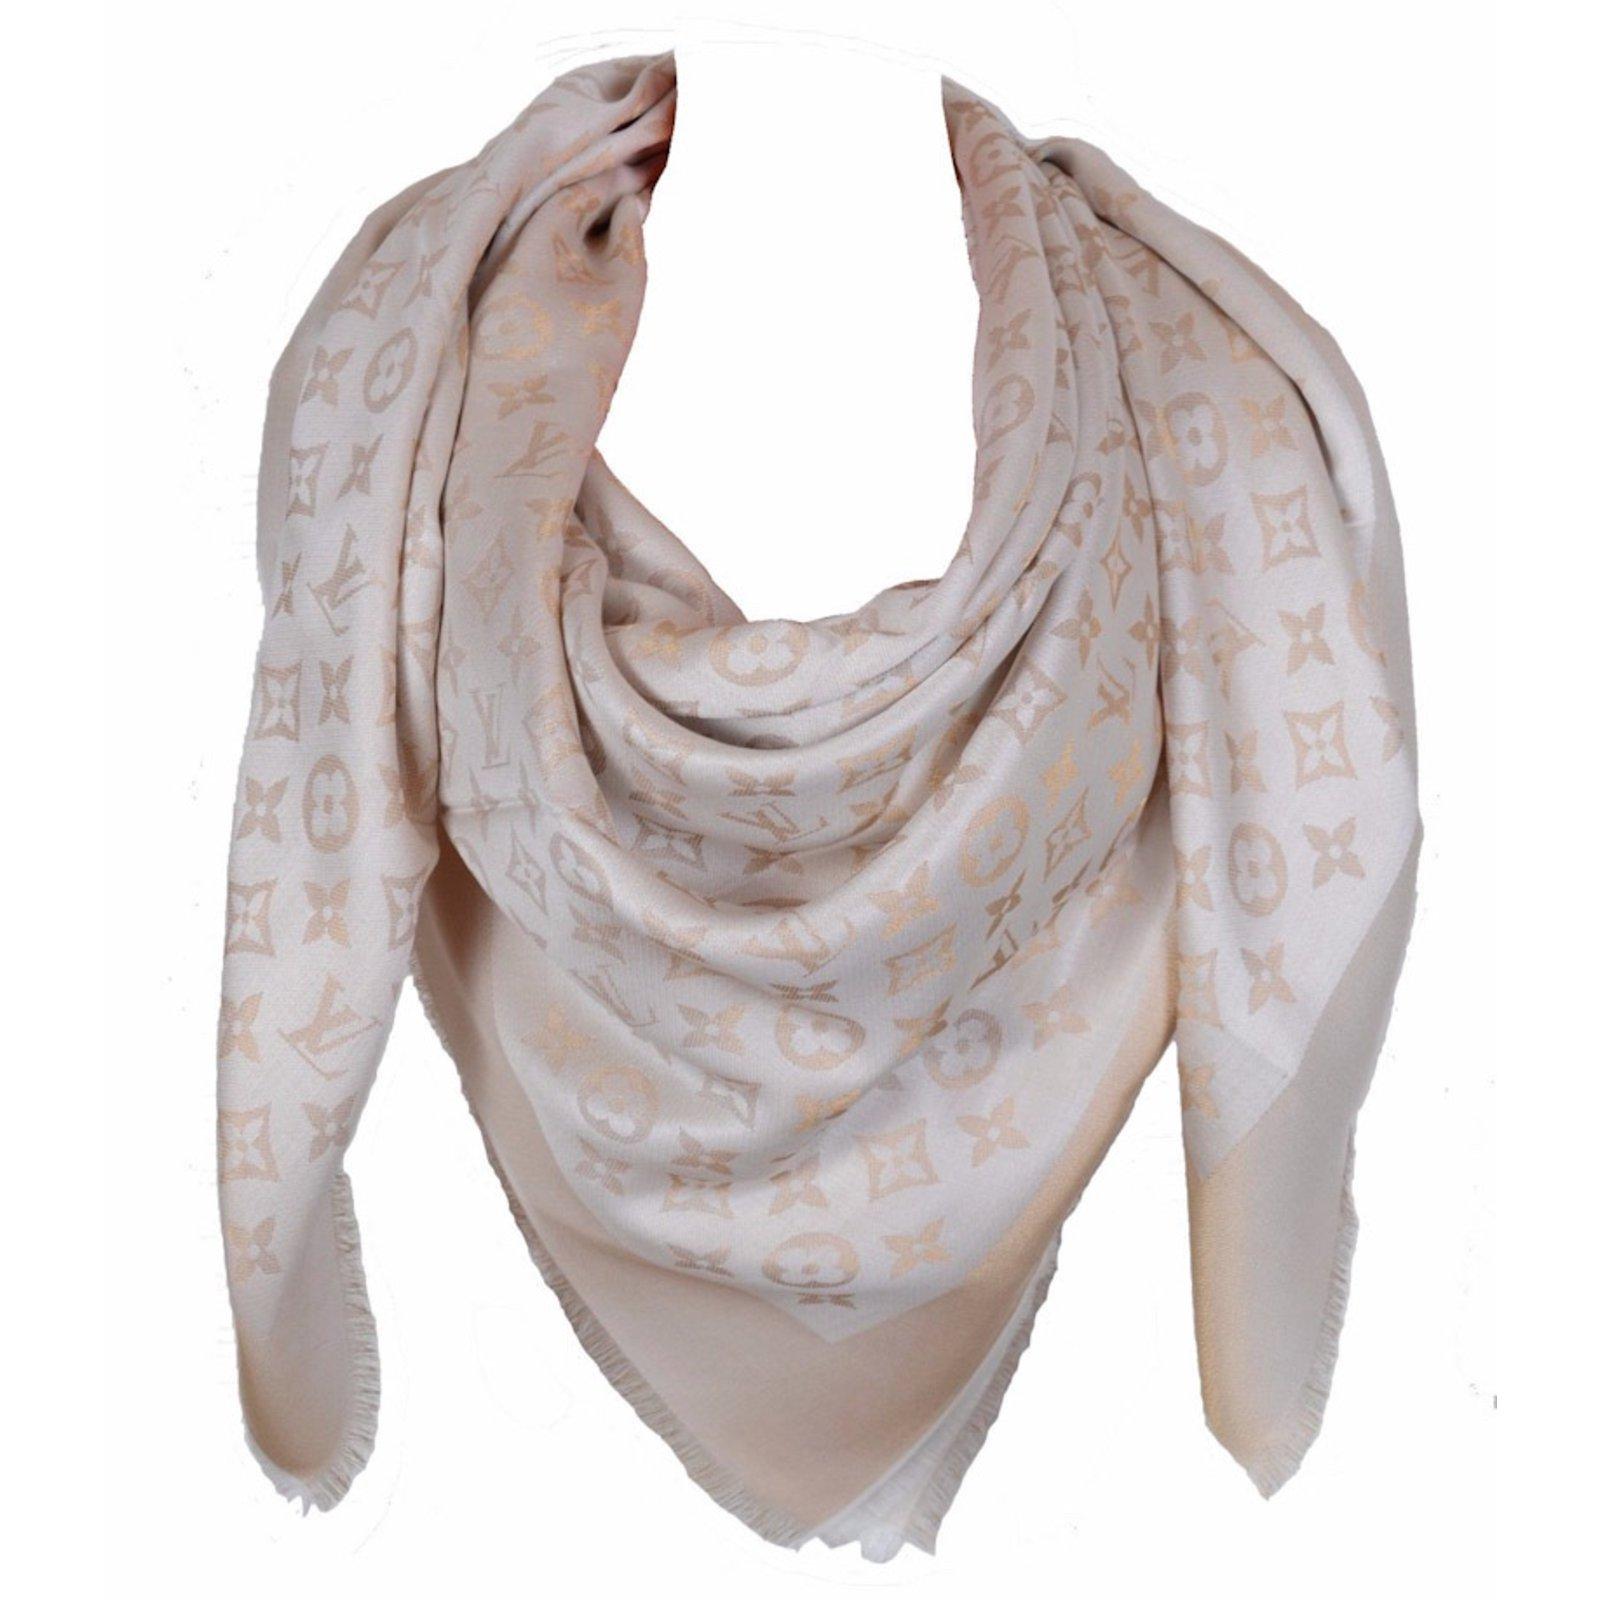 804e0d38a929 Louis Vuitton Classical Monogram Scarf Scarves Silk Beige ref.53206 ...